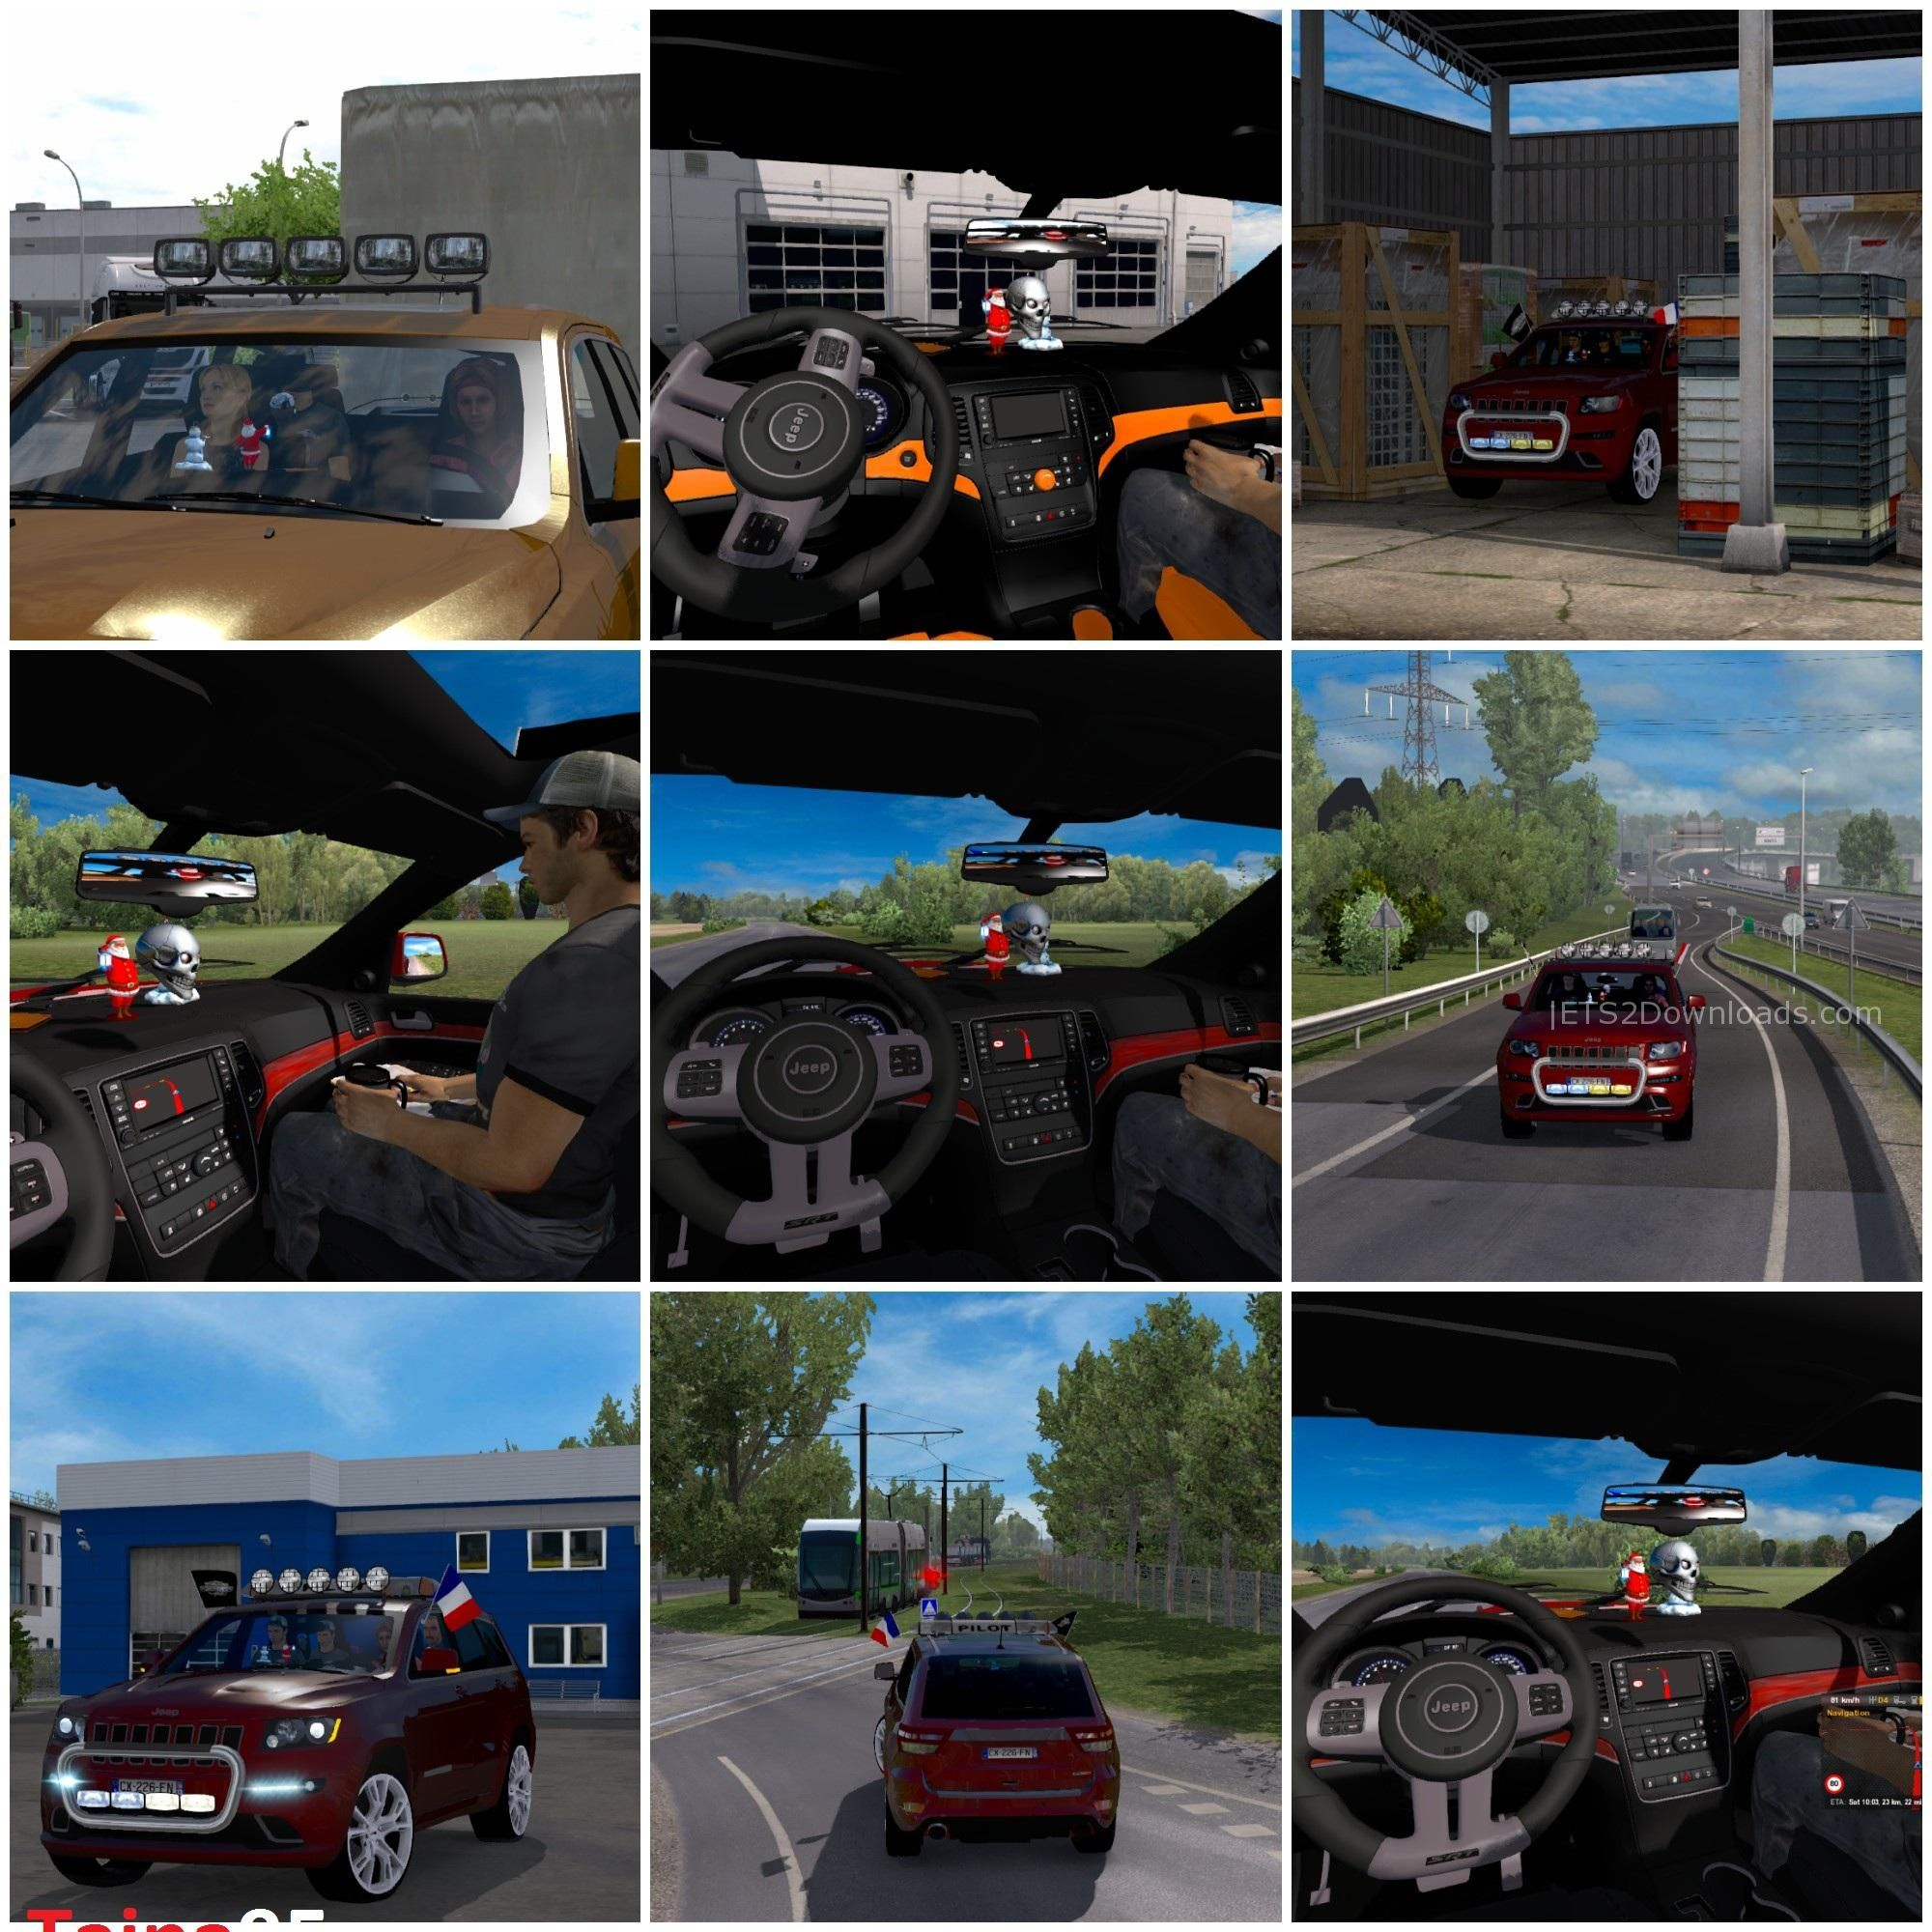 jeep-grand-cherokee-srt8-2-2